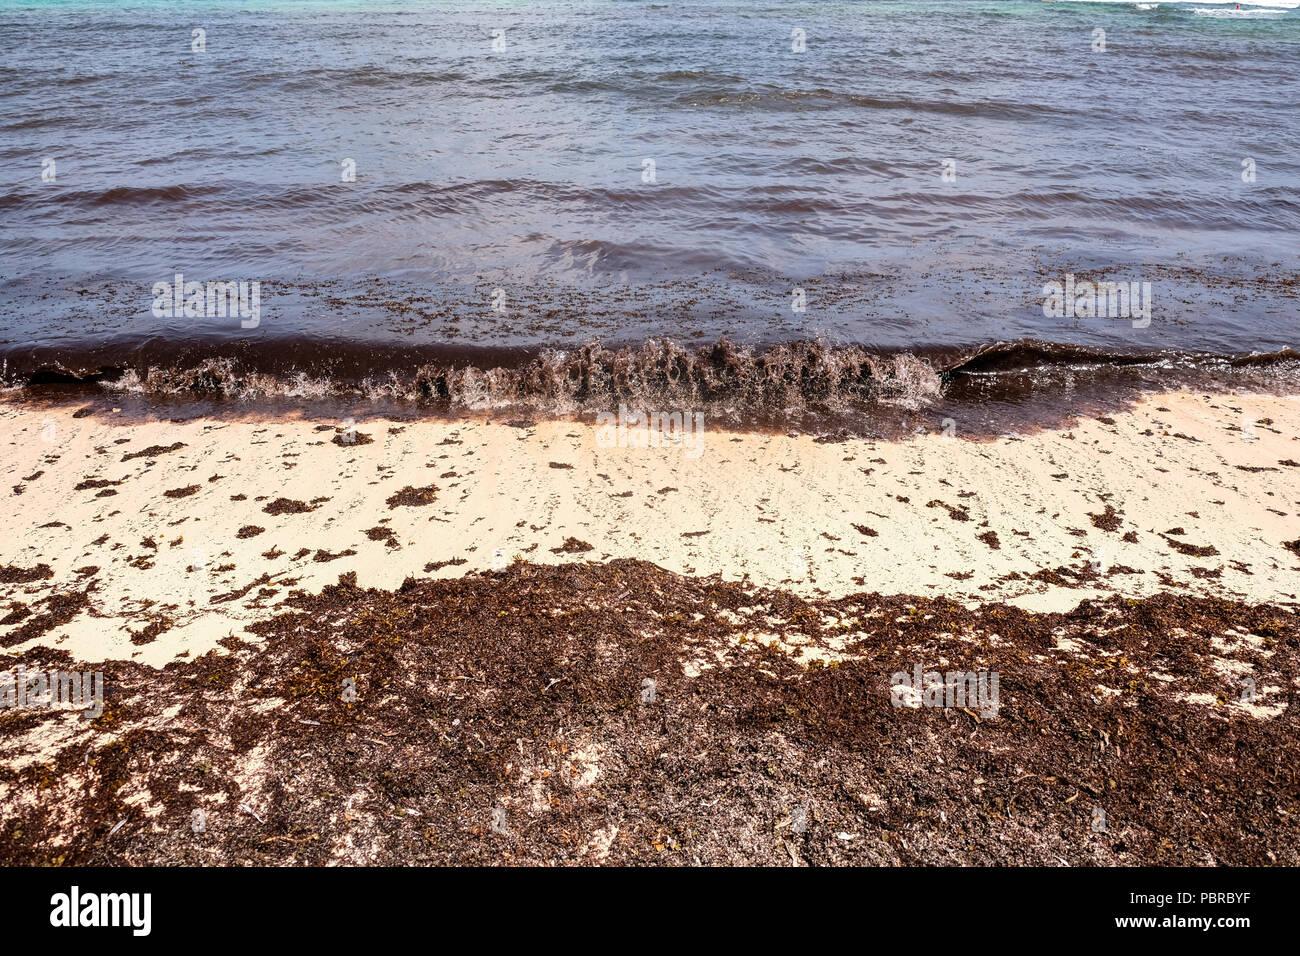 Masses of seaweeds washed up on beaches at Cayman Island - Stock Image